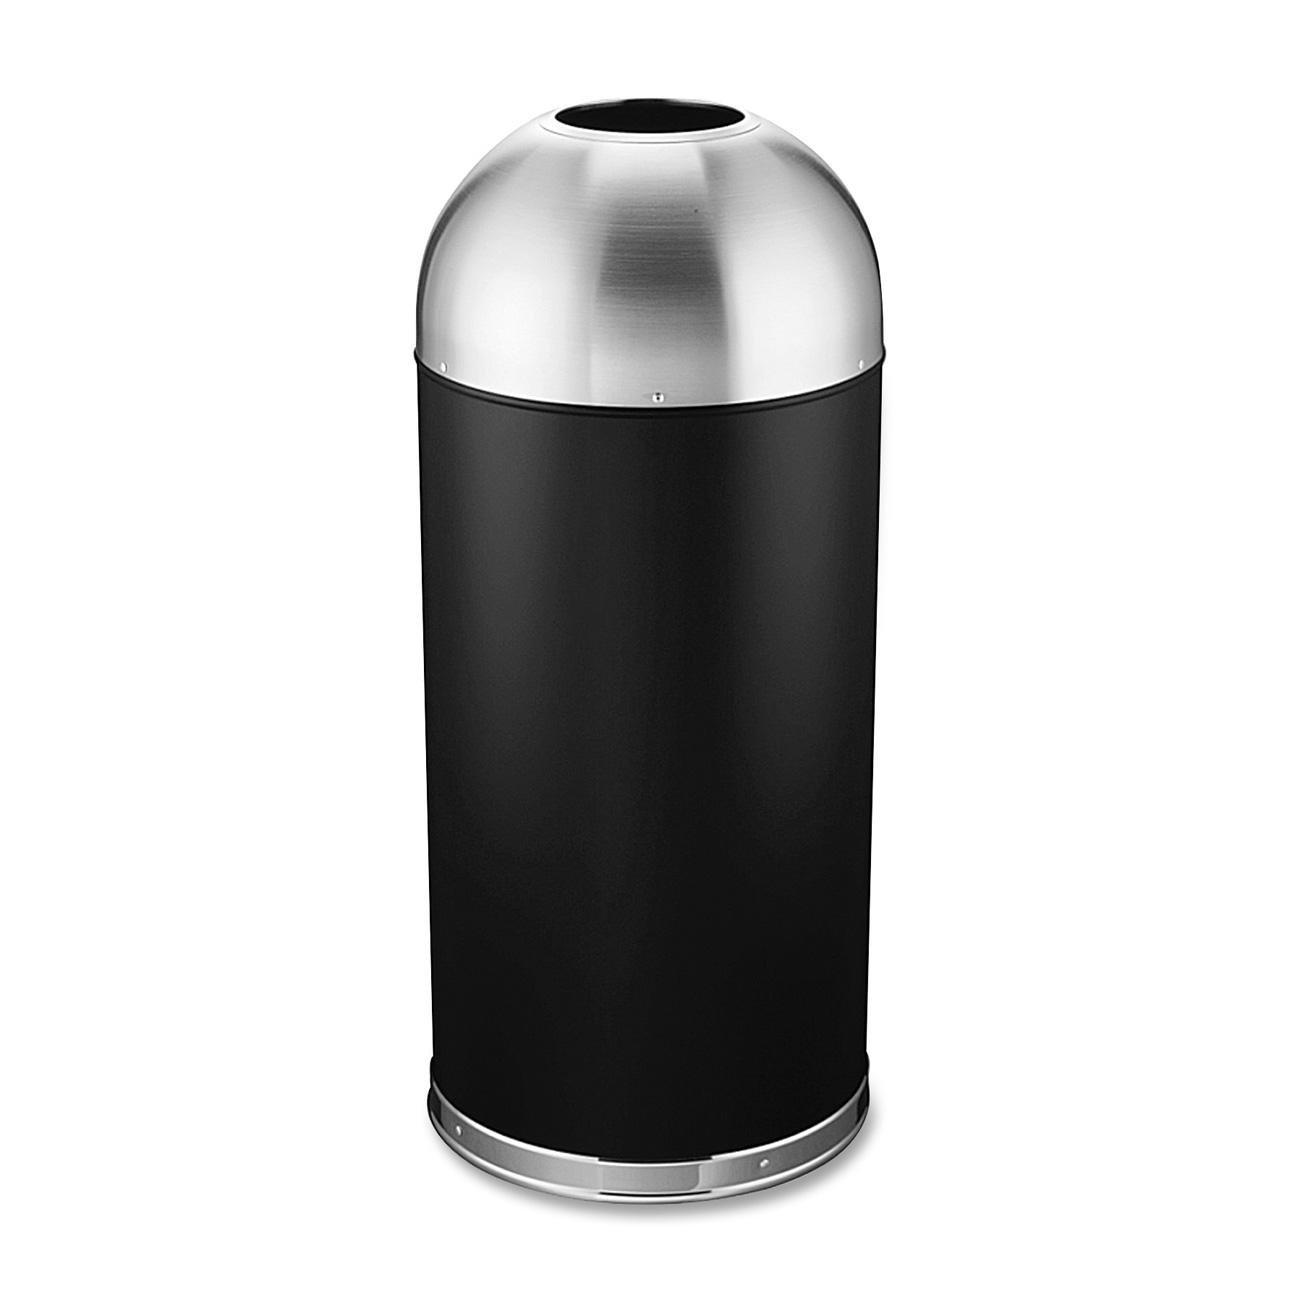 Genuine Joe GJO58896 Stainless Steel Domed Top Trash Receptacle, 15 gallon Capacity, Black/Silver by Genuine Joe